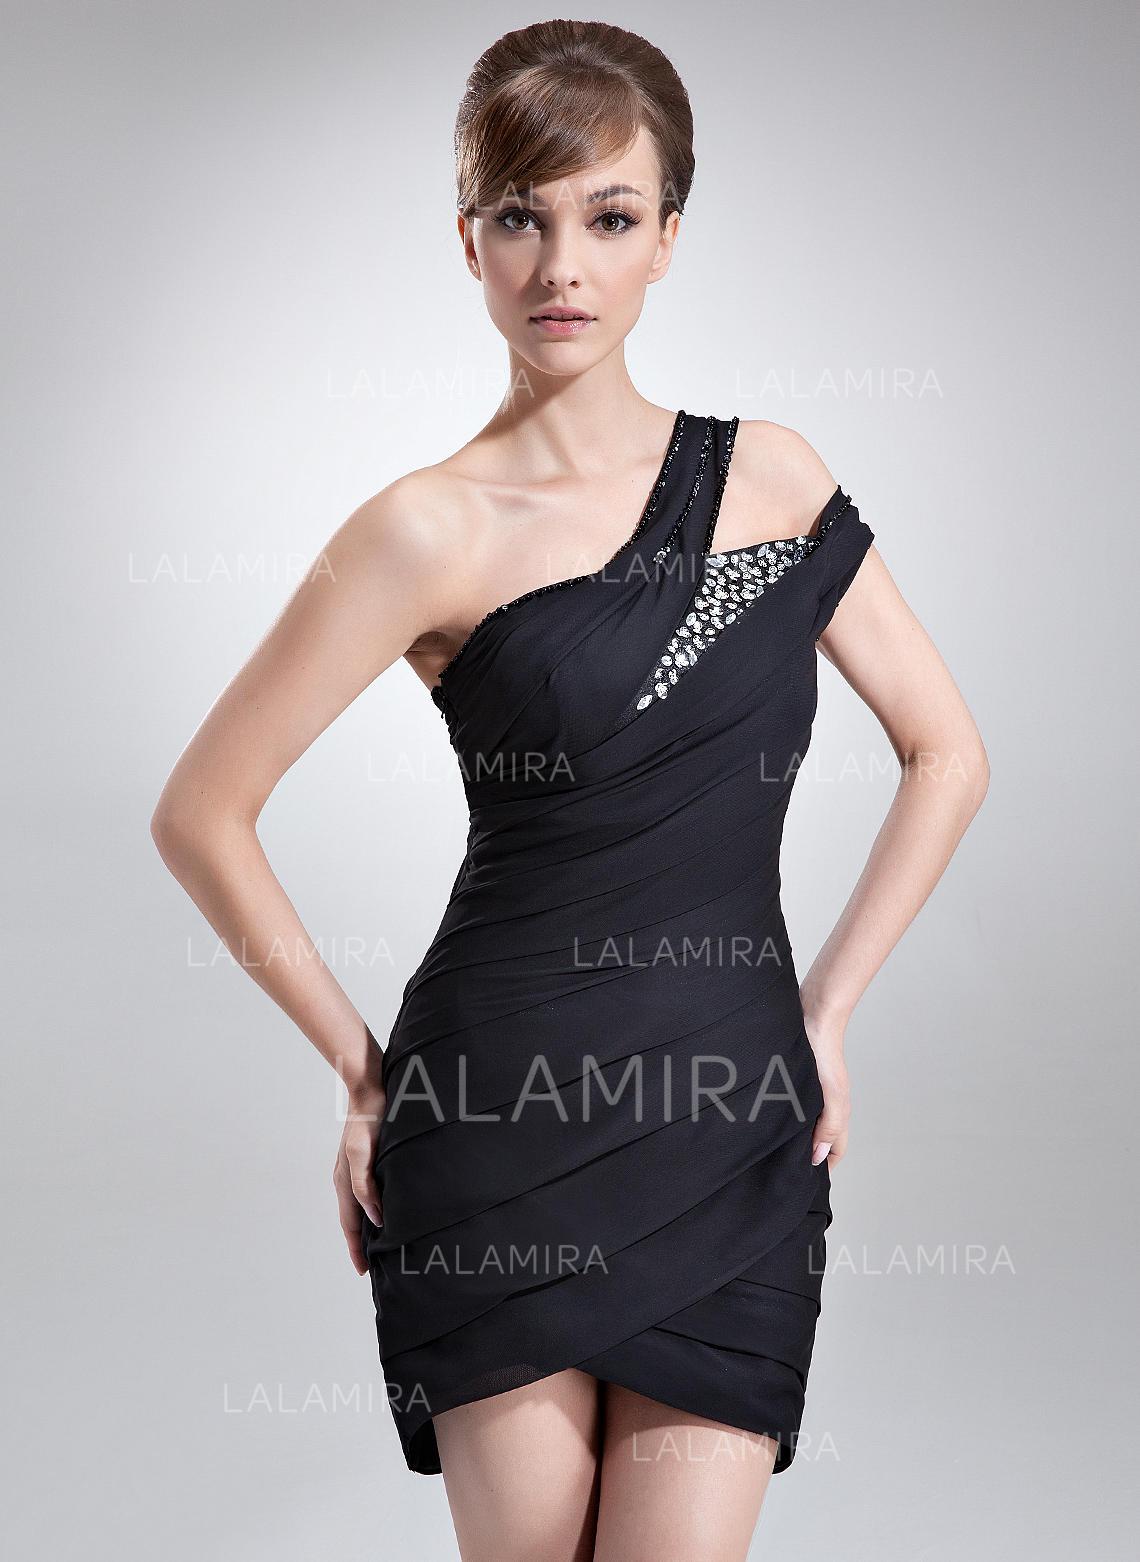 cf79bdaa2565 One-Shoulder Sleeveless Chiffon Sheath/Column Cocktail Dresses (016008341). Loading  zoom